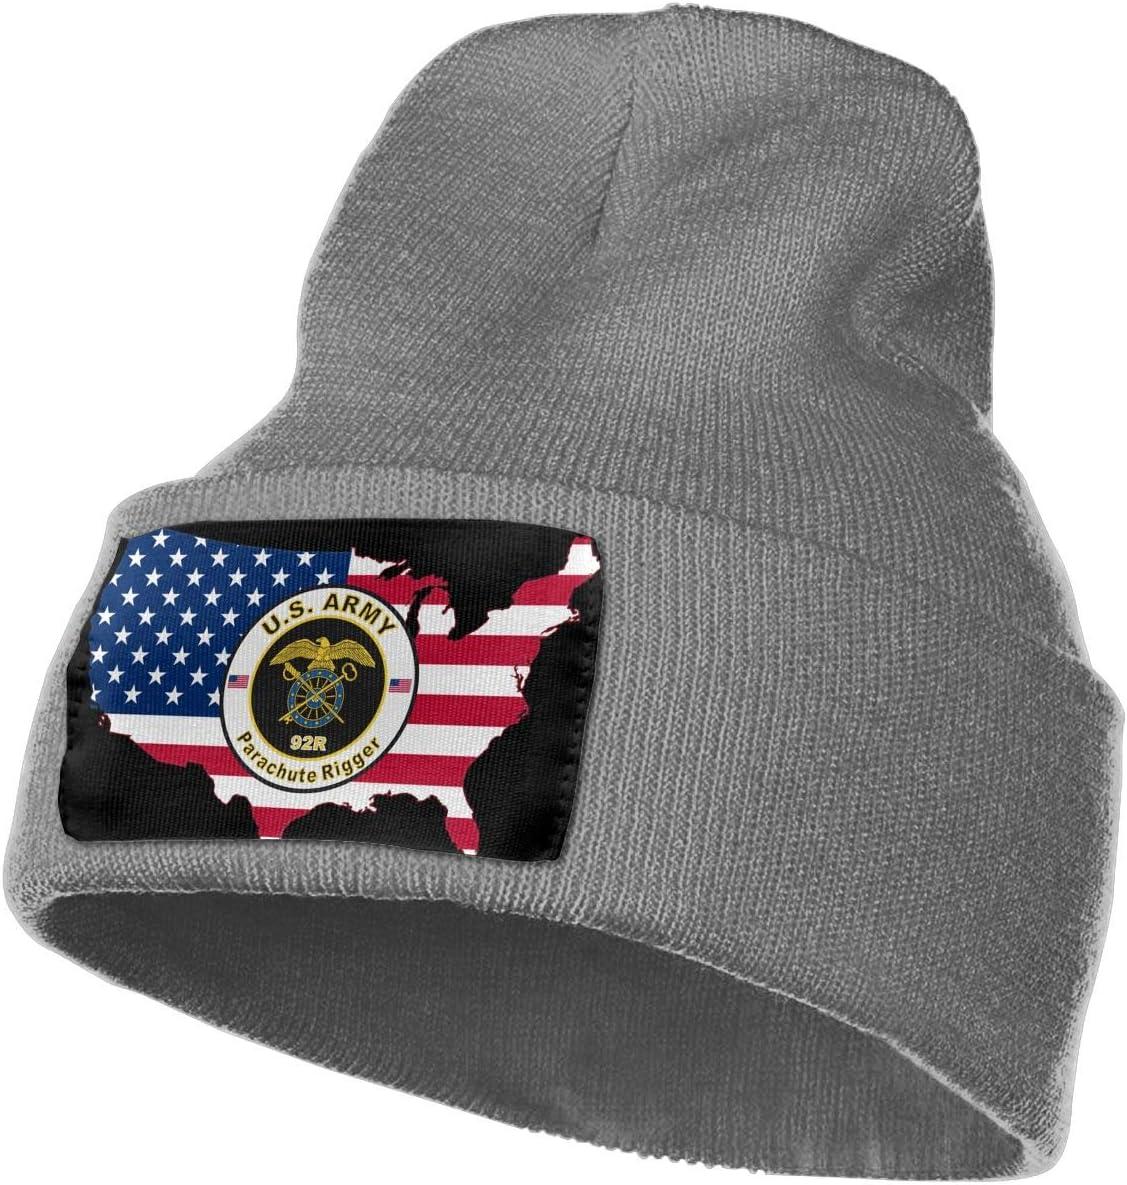 American Flag Map Army MOS 92R Parachute Rigger Men/&Women Warm Winter Knit Plain Beanie Hat Skull Cap Acrylic Knit Cuff Hat